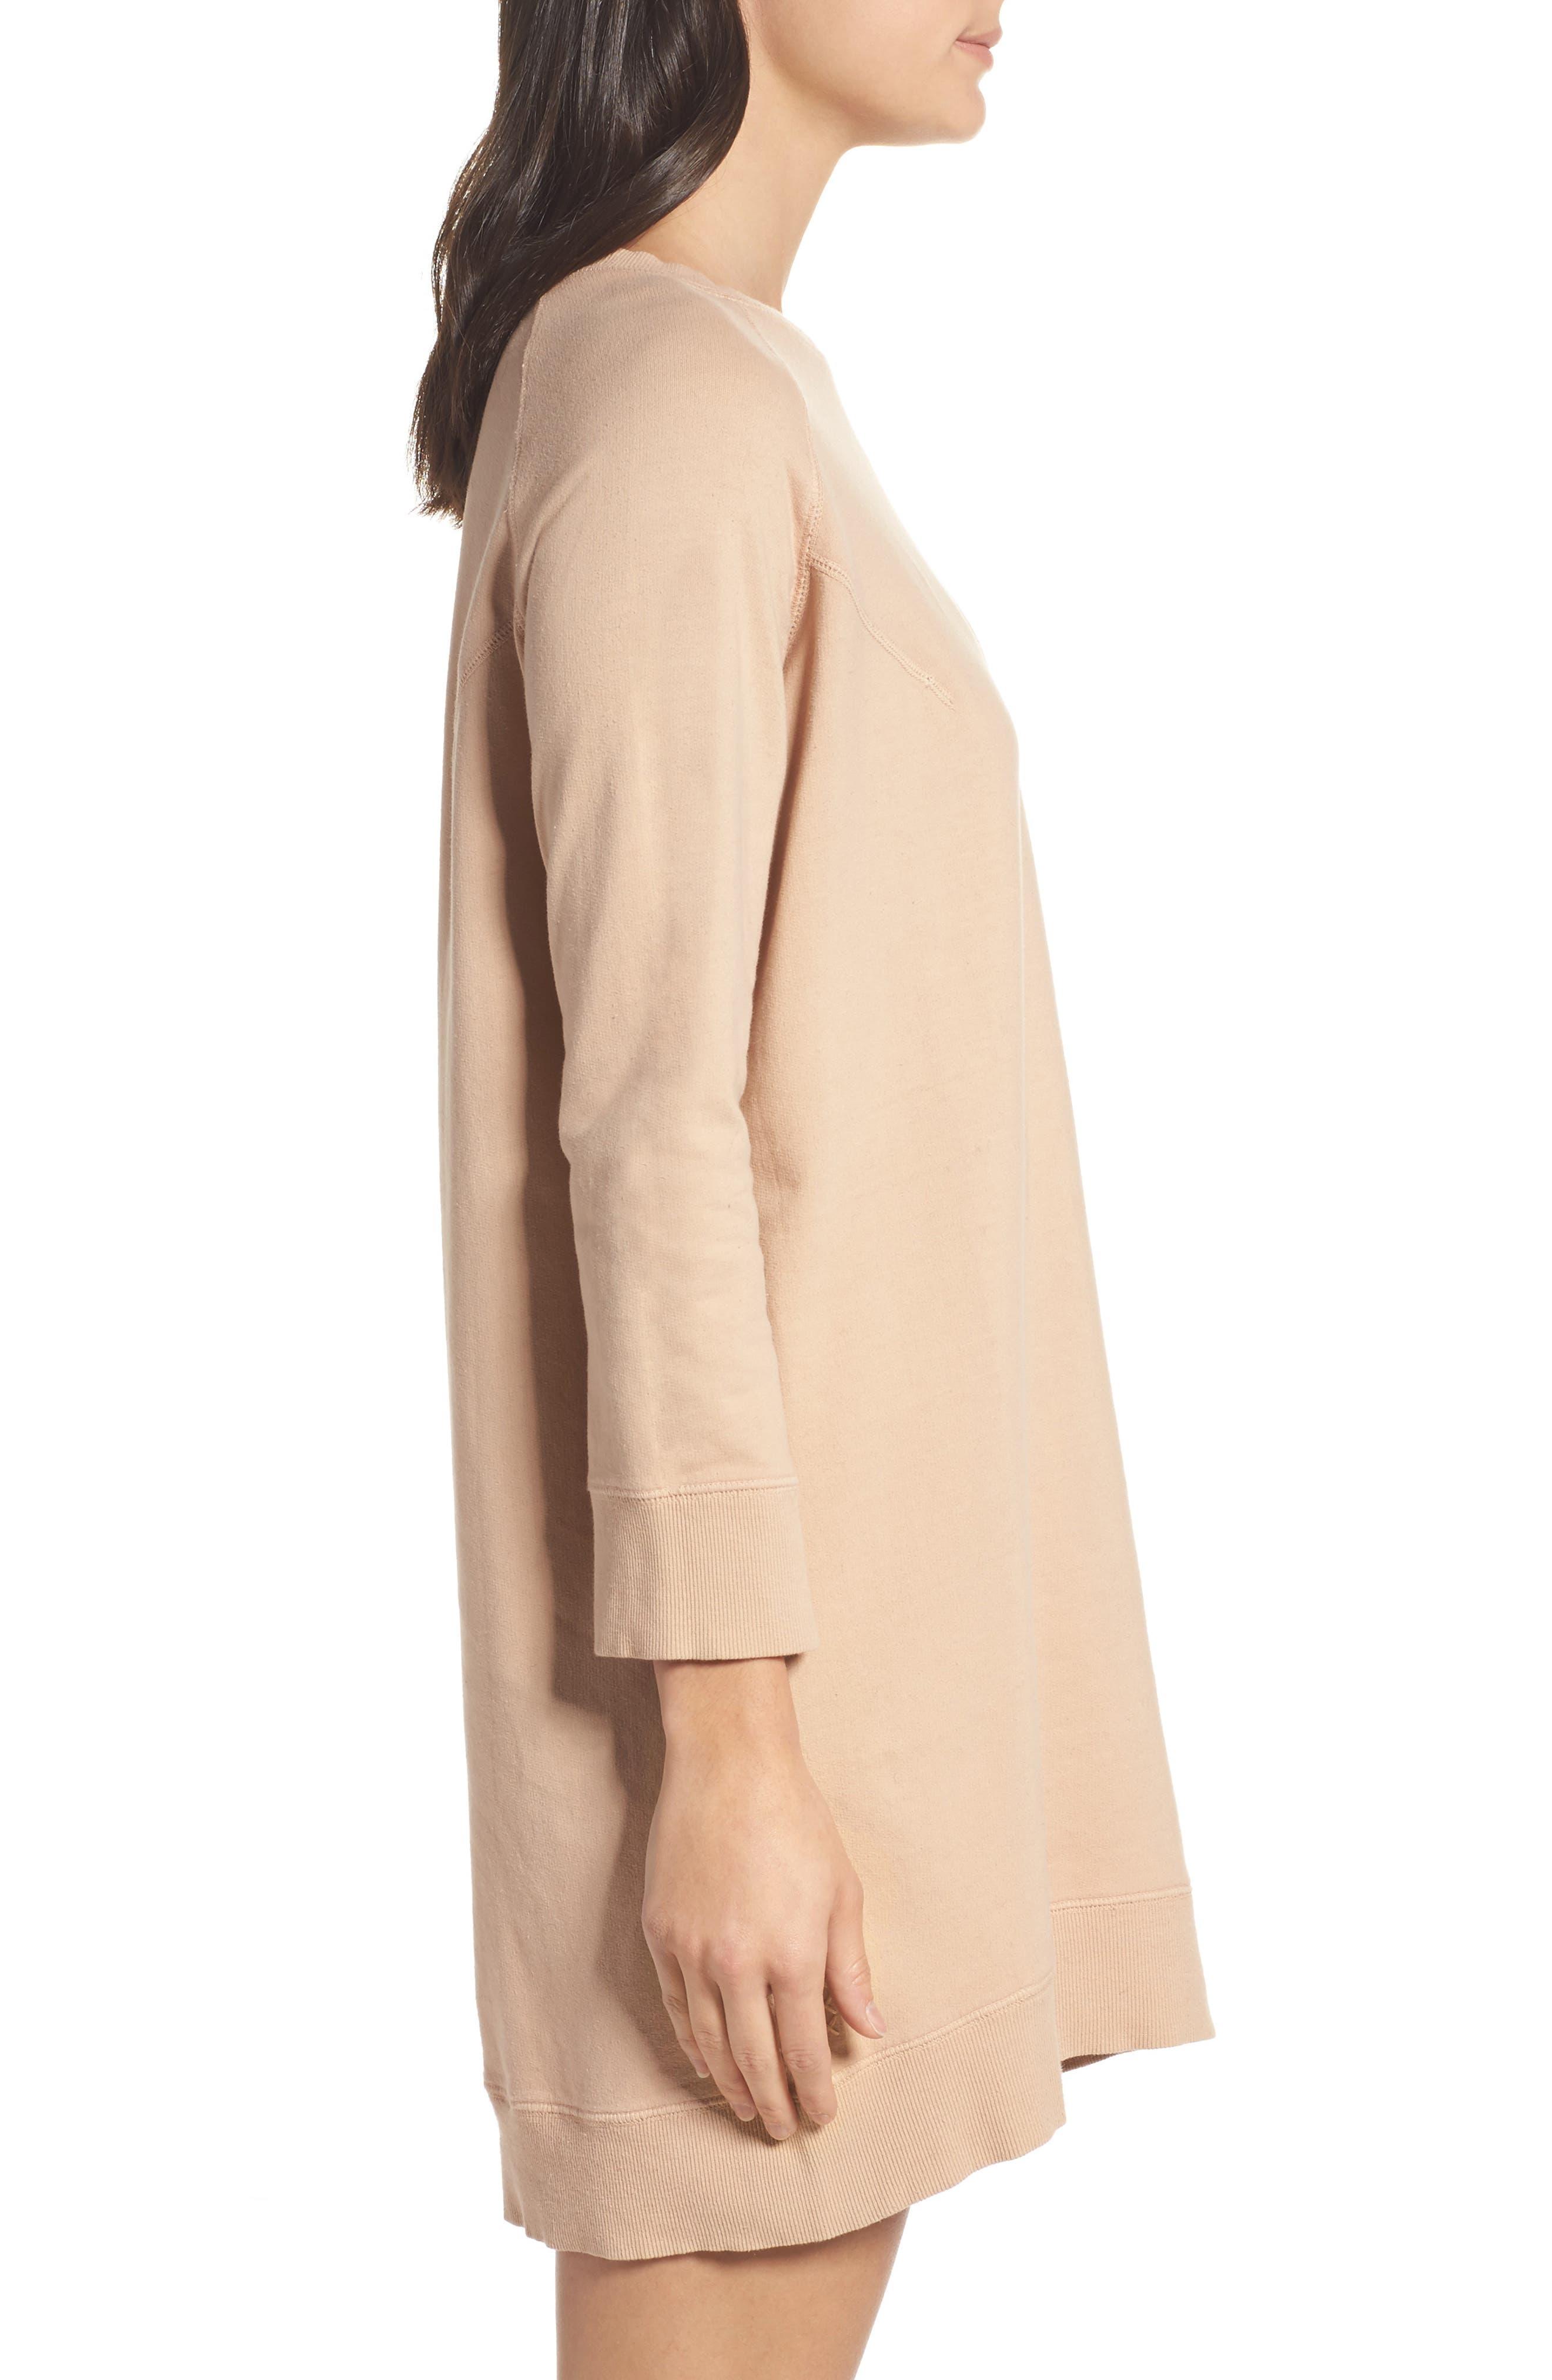 Sweatshirt Dress,                             Alternate thumbnail 3, color,                             Nude